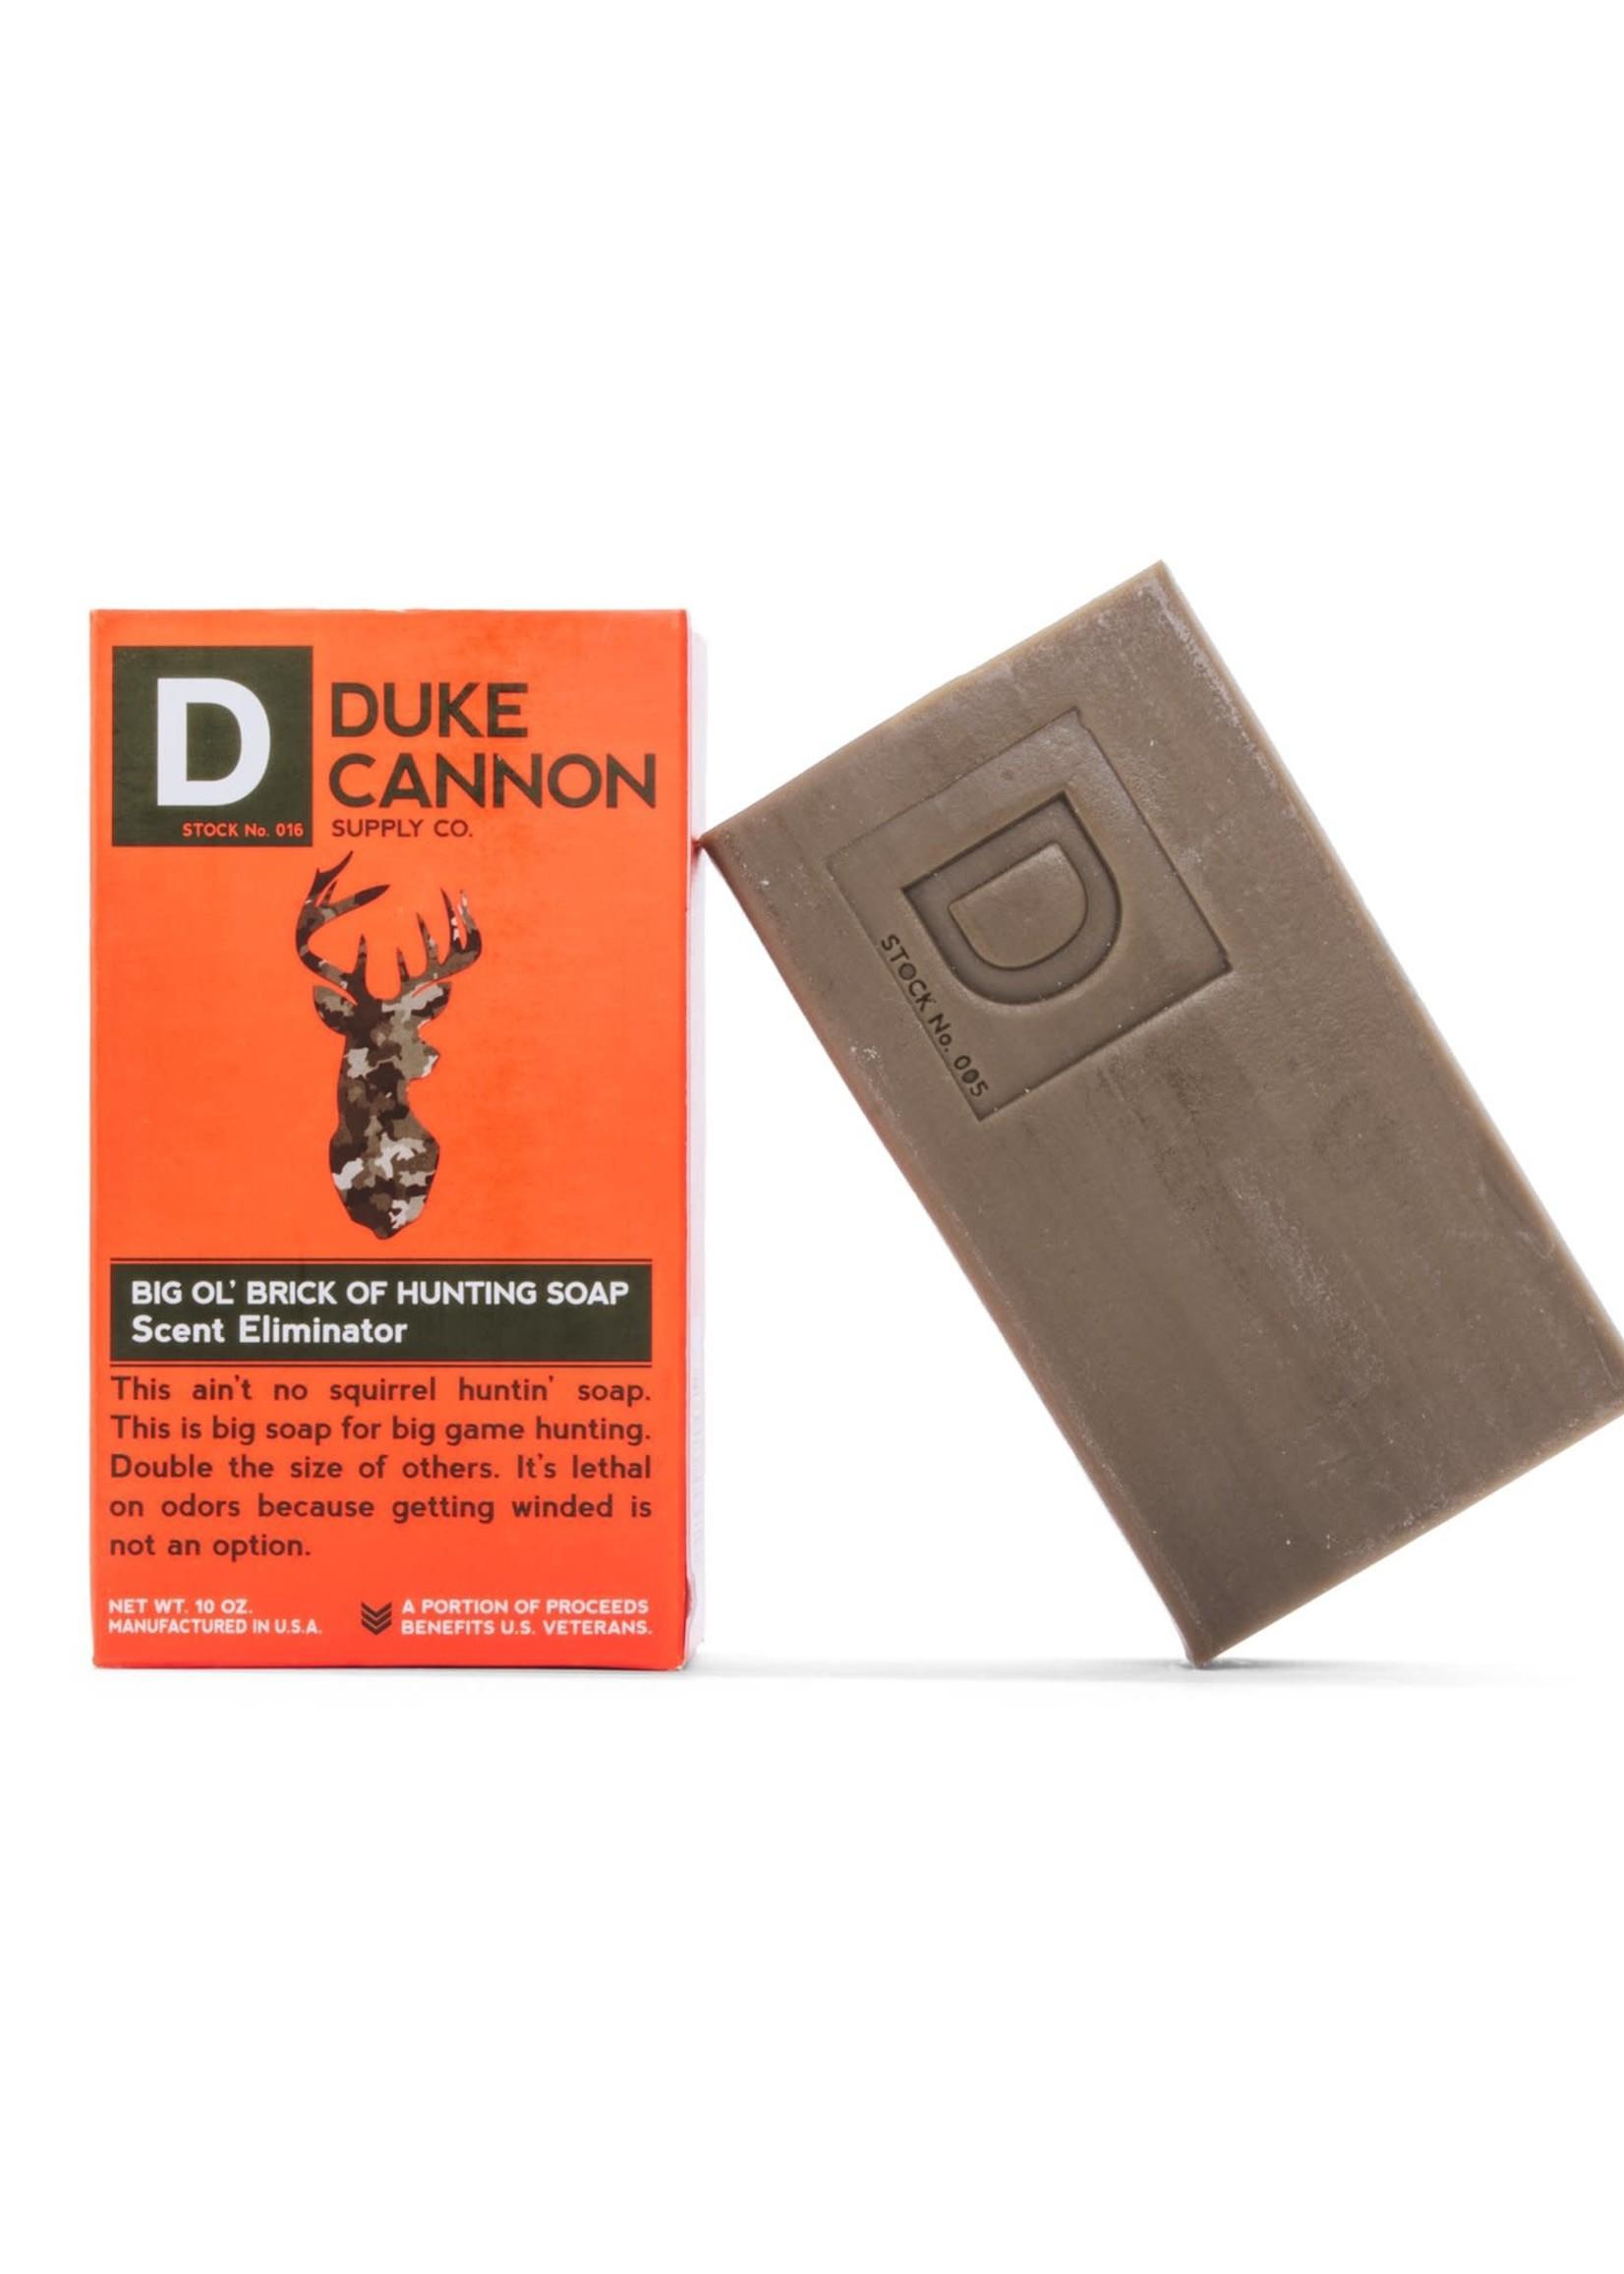 Big Ol' Brick of Hunting Soap